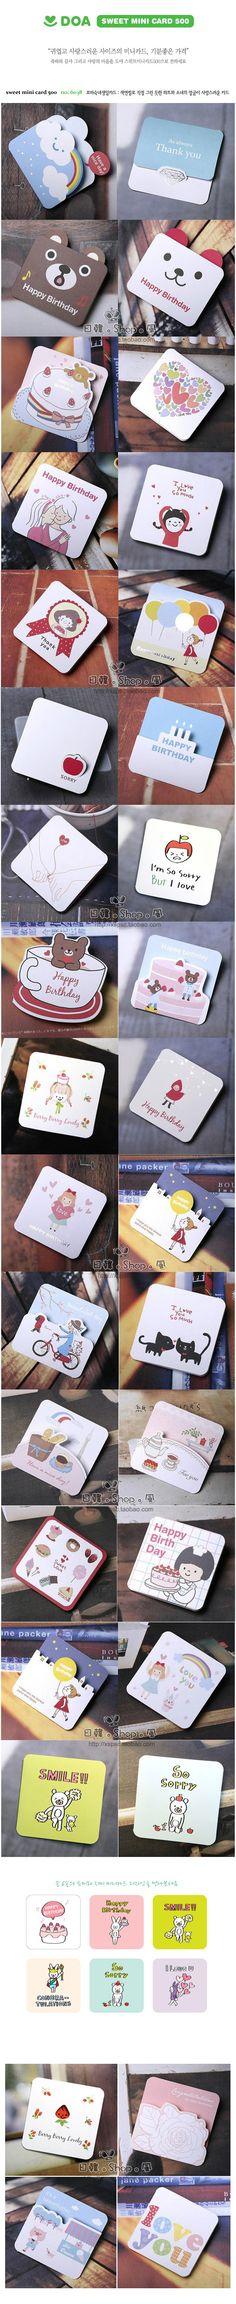 Aliexpress.com: Comprar 2 packs / lot plegable de la historieta postal de tarjetas de felicitación tarjeta de regalo de cumpleaños mensaje bloc de notas con el sobre de embelishments tarjeta fiable proveedores en Look Here- More Suprise